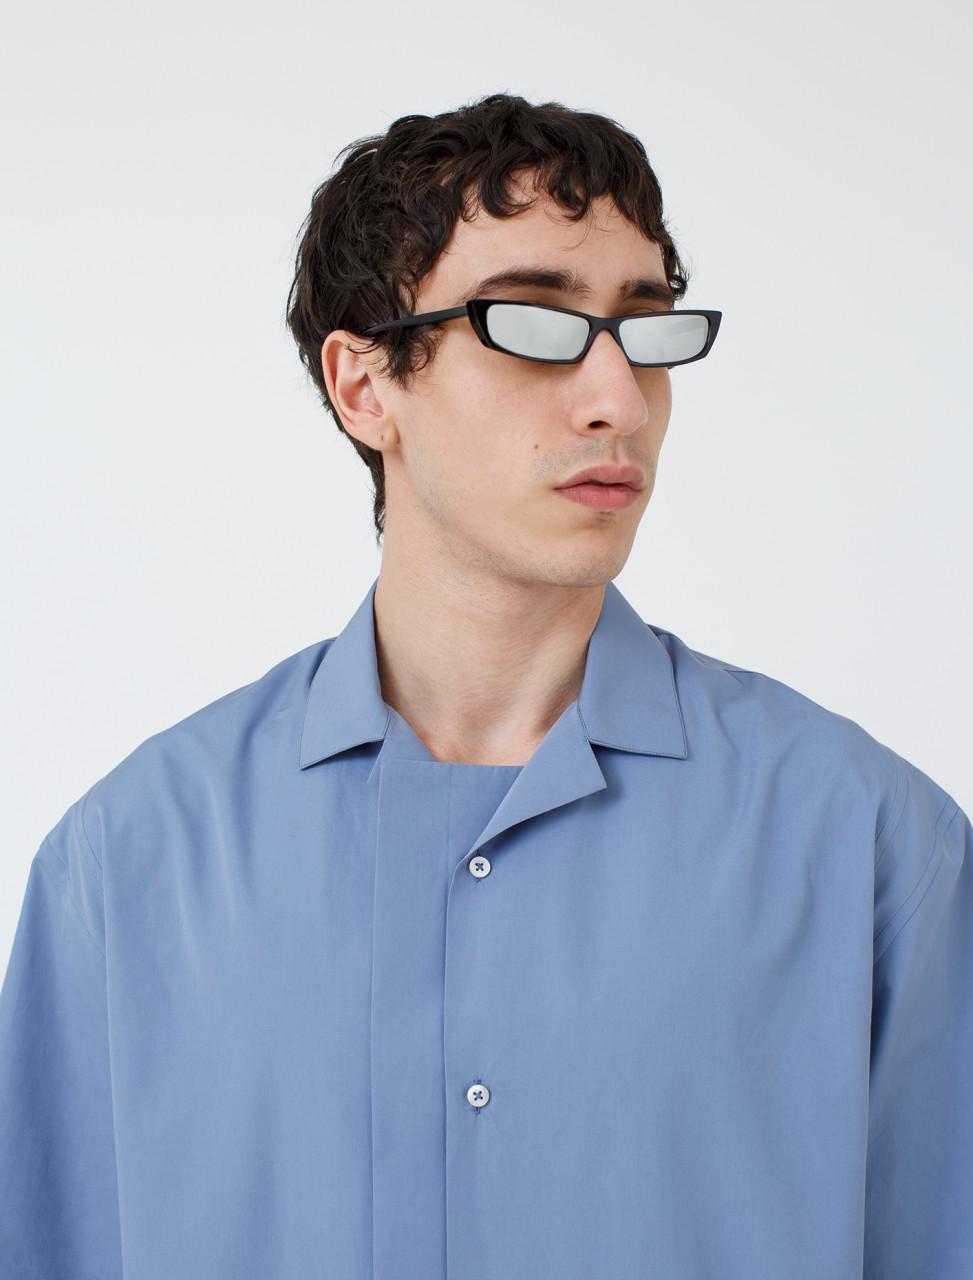 Agar Sunglasses